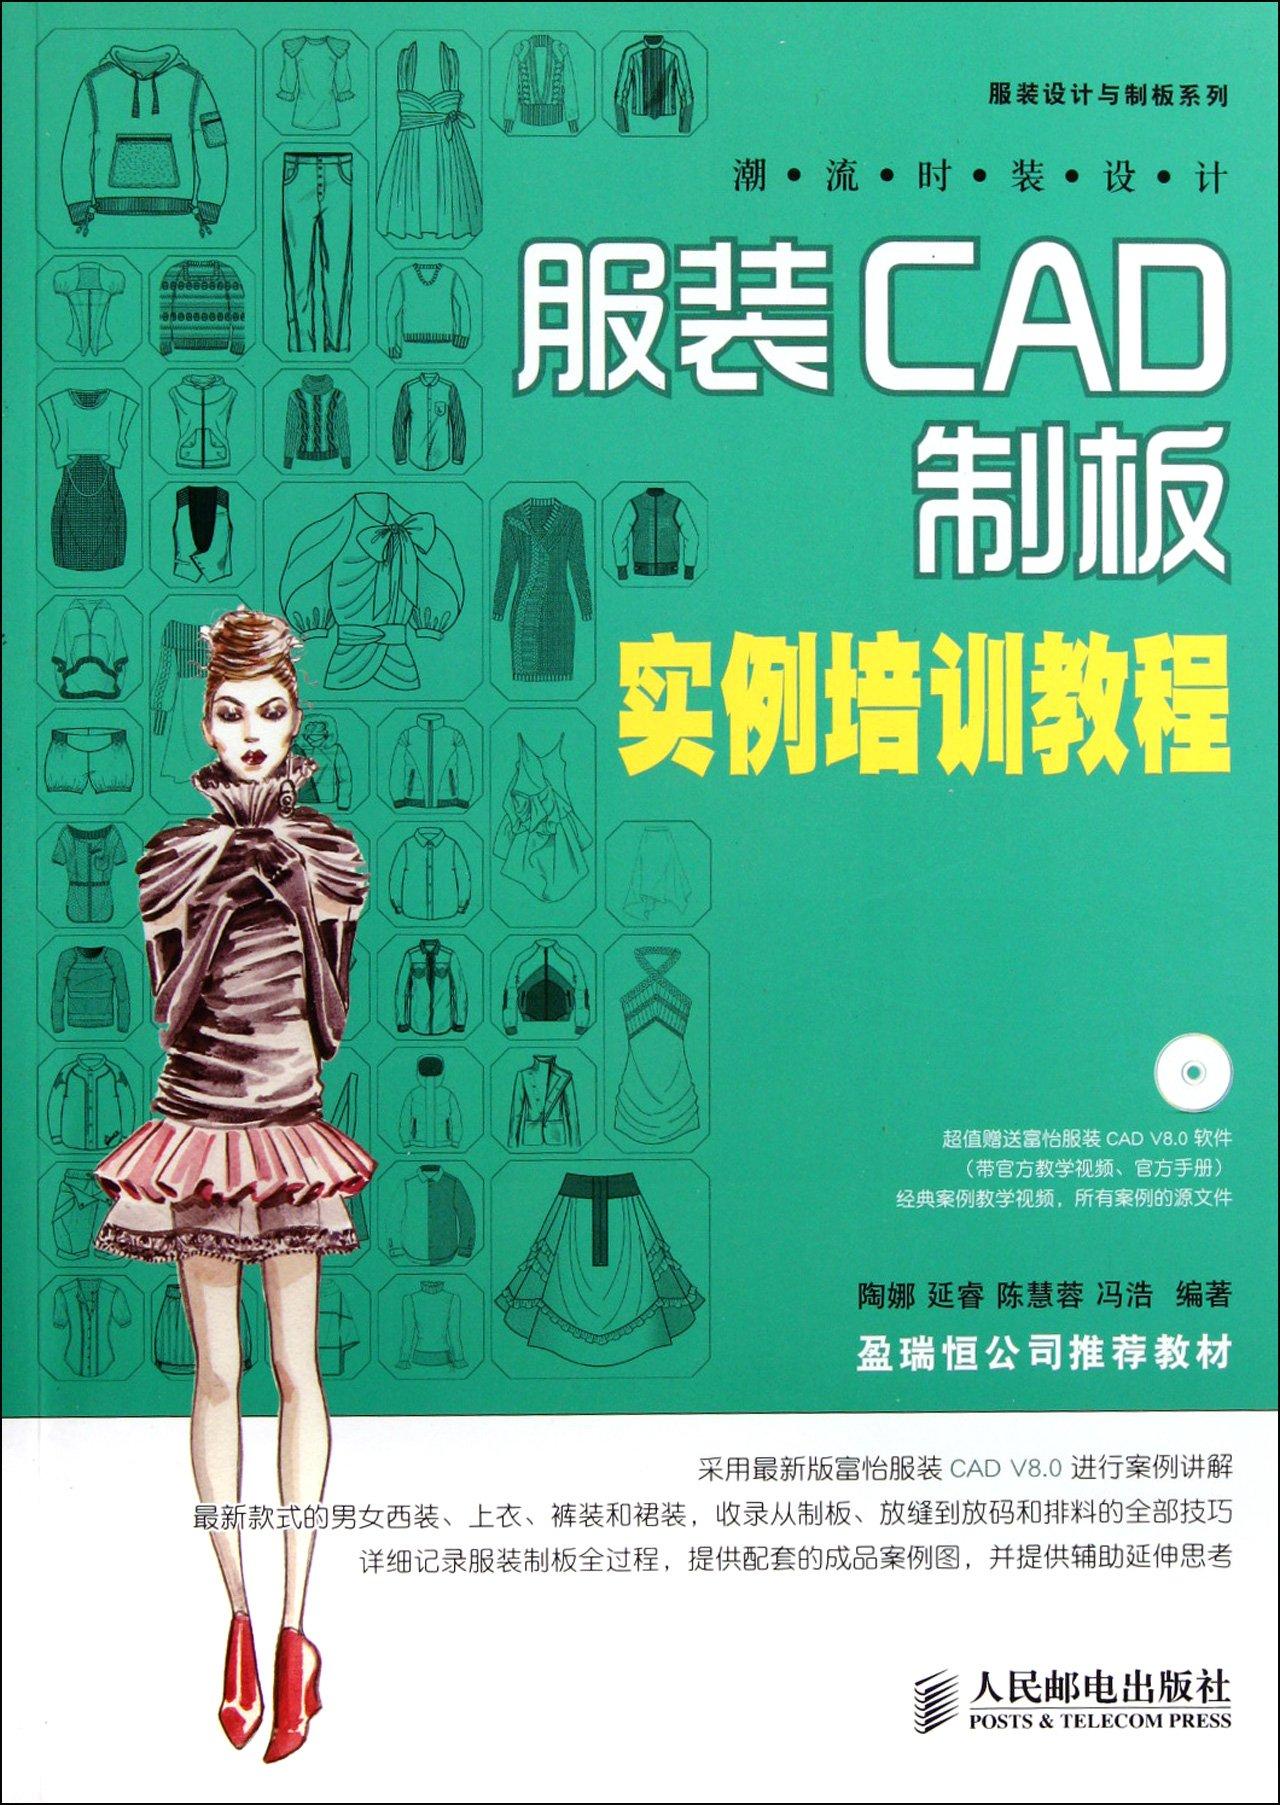 Fashion Design Case Training For Fashion Cad Plating Chinese Edition Tao Na Yan Rui Chen Hui Rong Feng Hao 9787115274243 Amazon Com Books